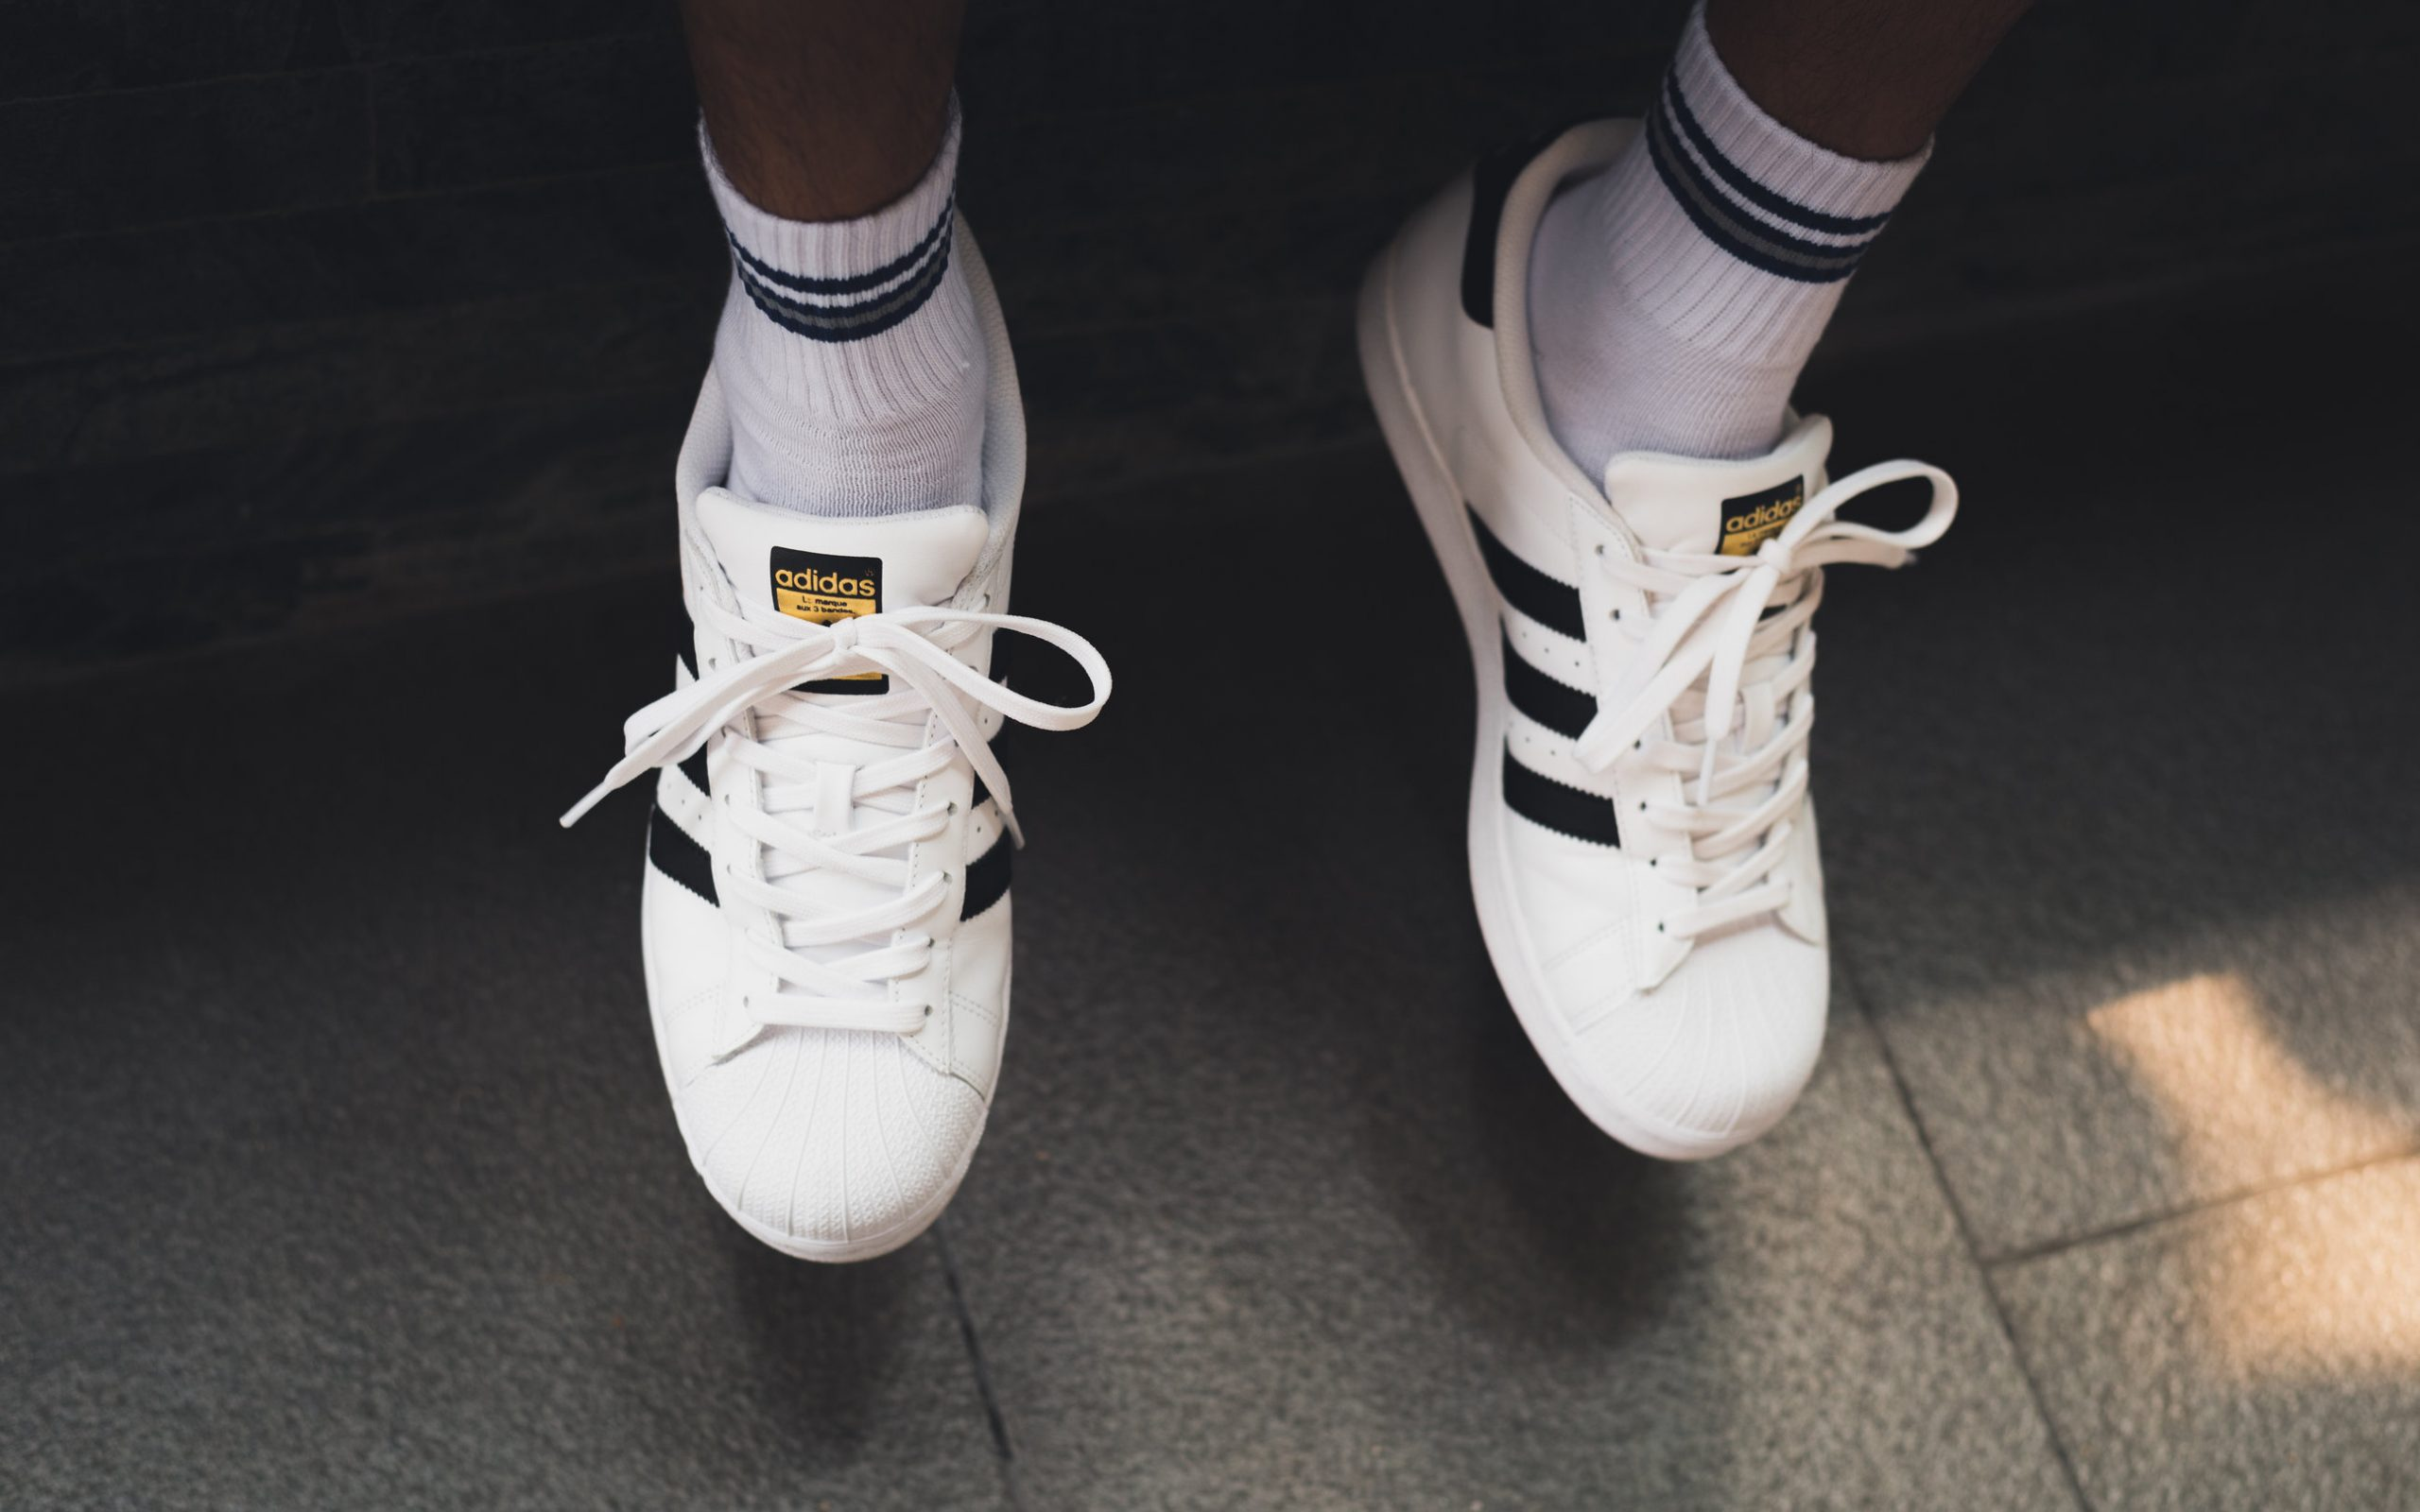 Persona usando calcetines adidas